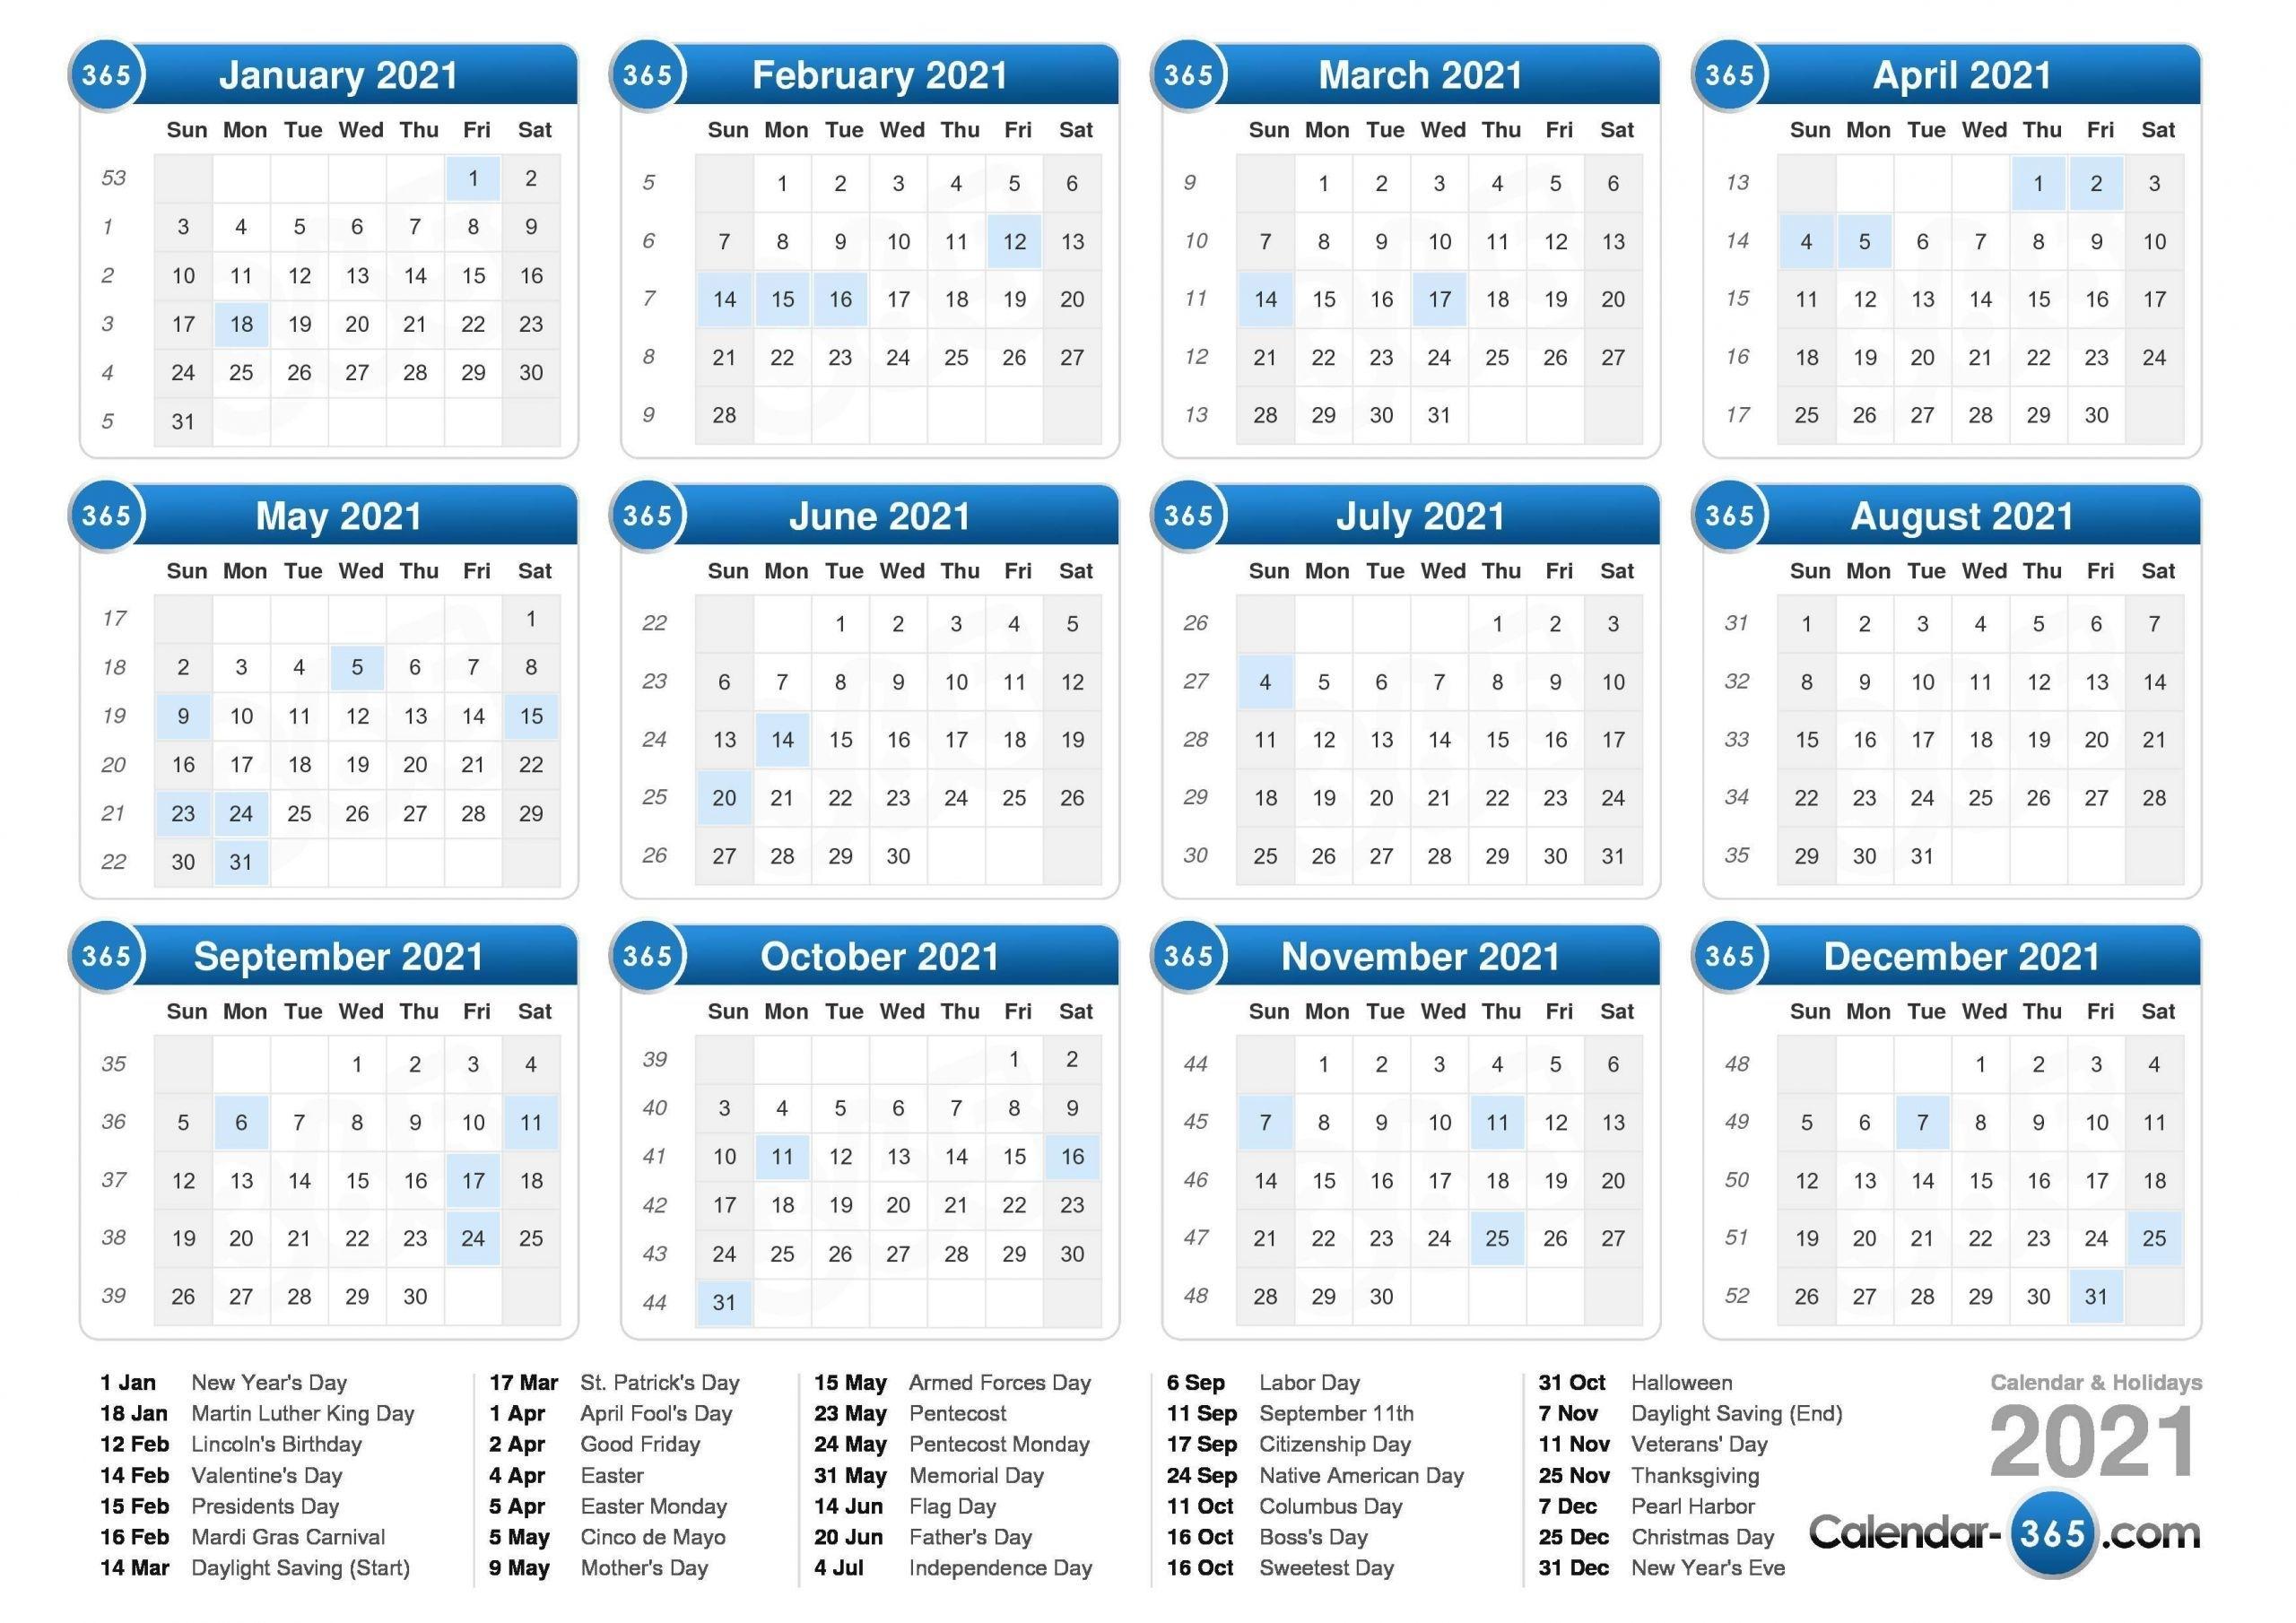 Get 2021 Calendar Financial With Week Number